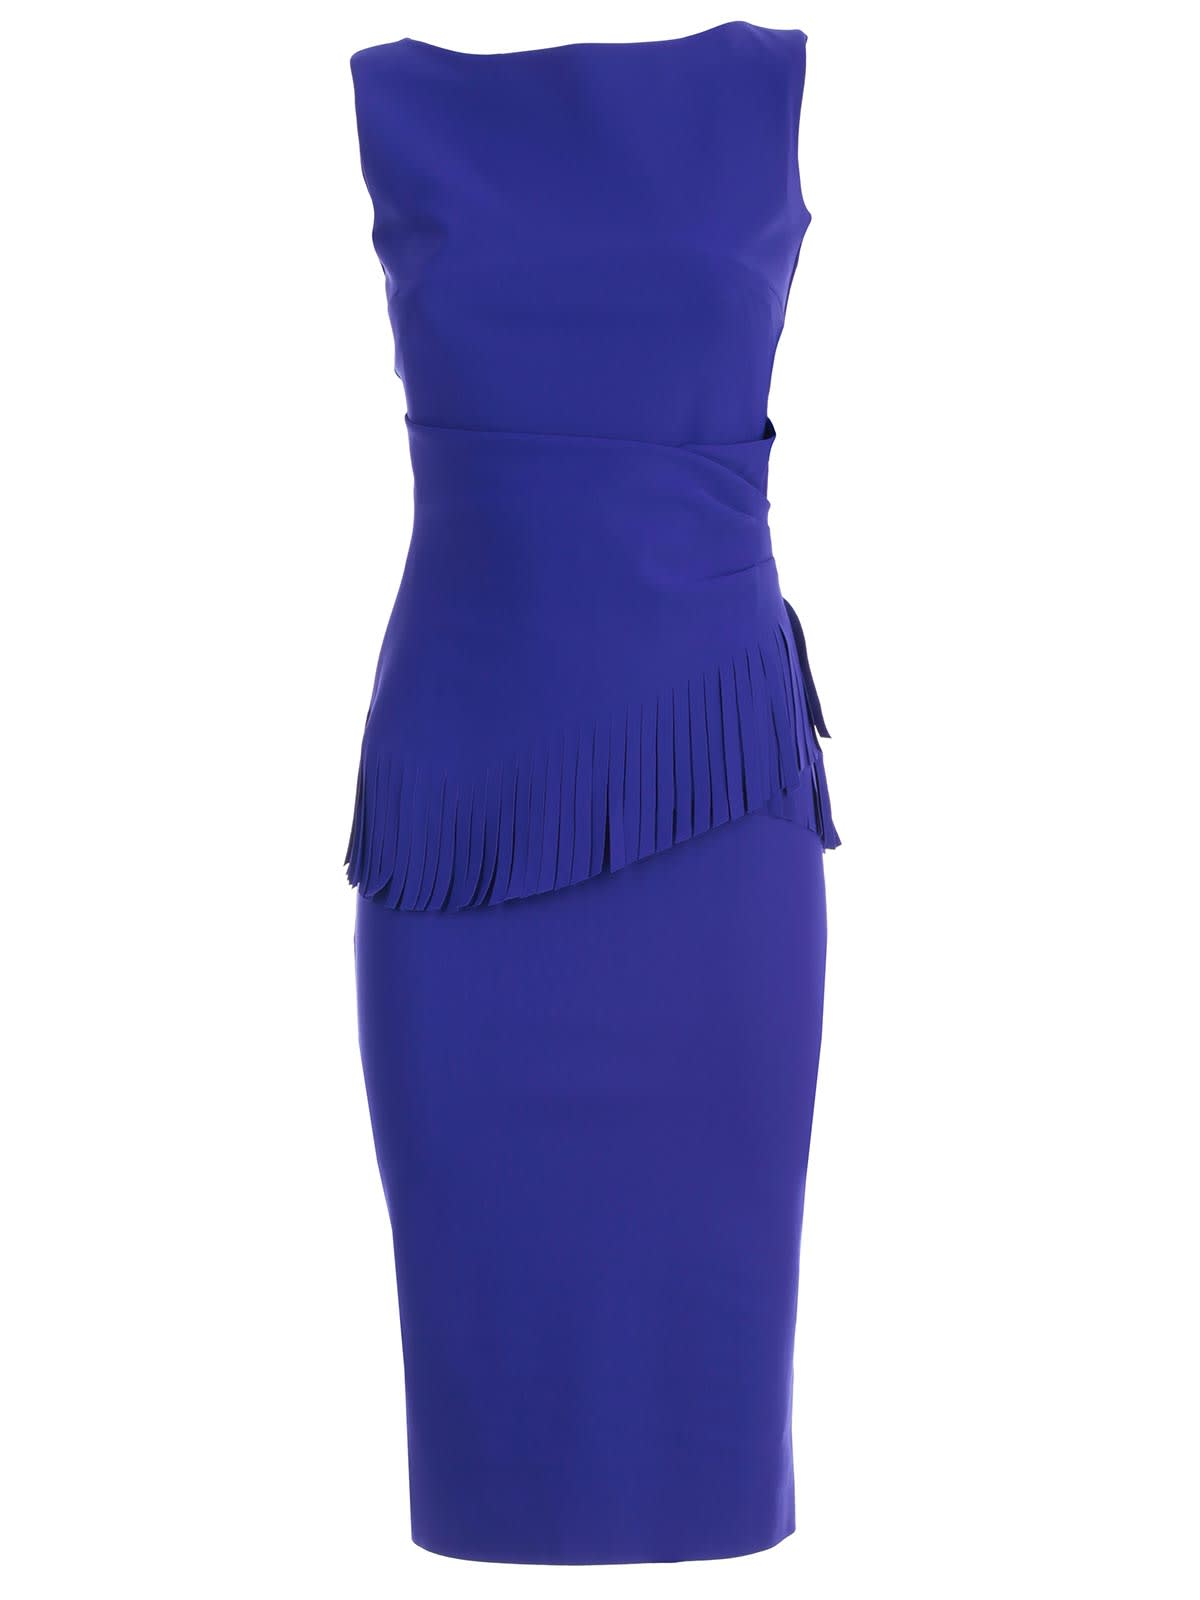 Buy La Petit Robe Di Chiara Boni Fayre Dress online, shop La Petit Robe Di Chiara Boni with free shipping